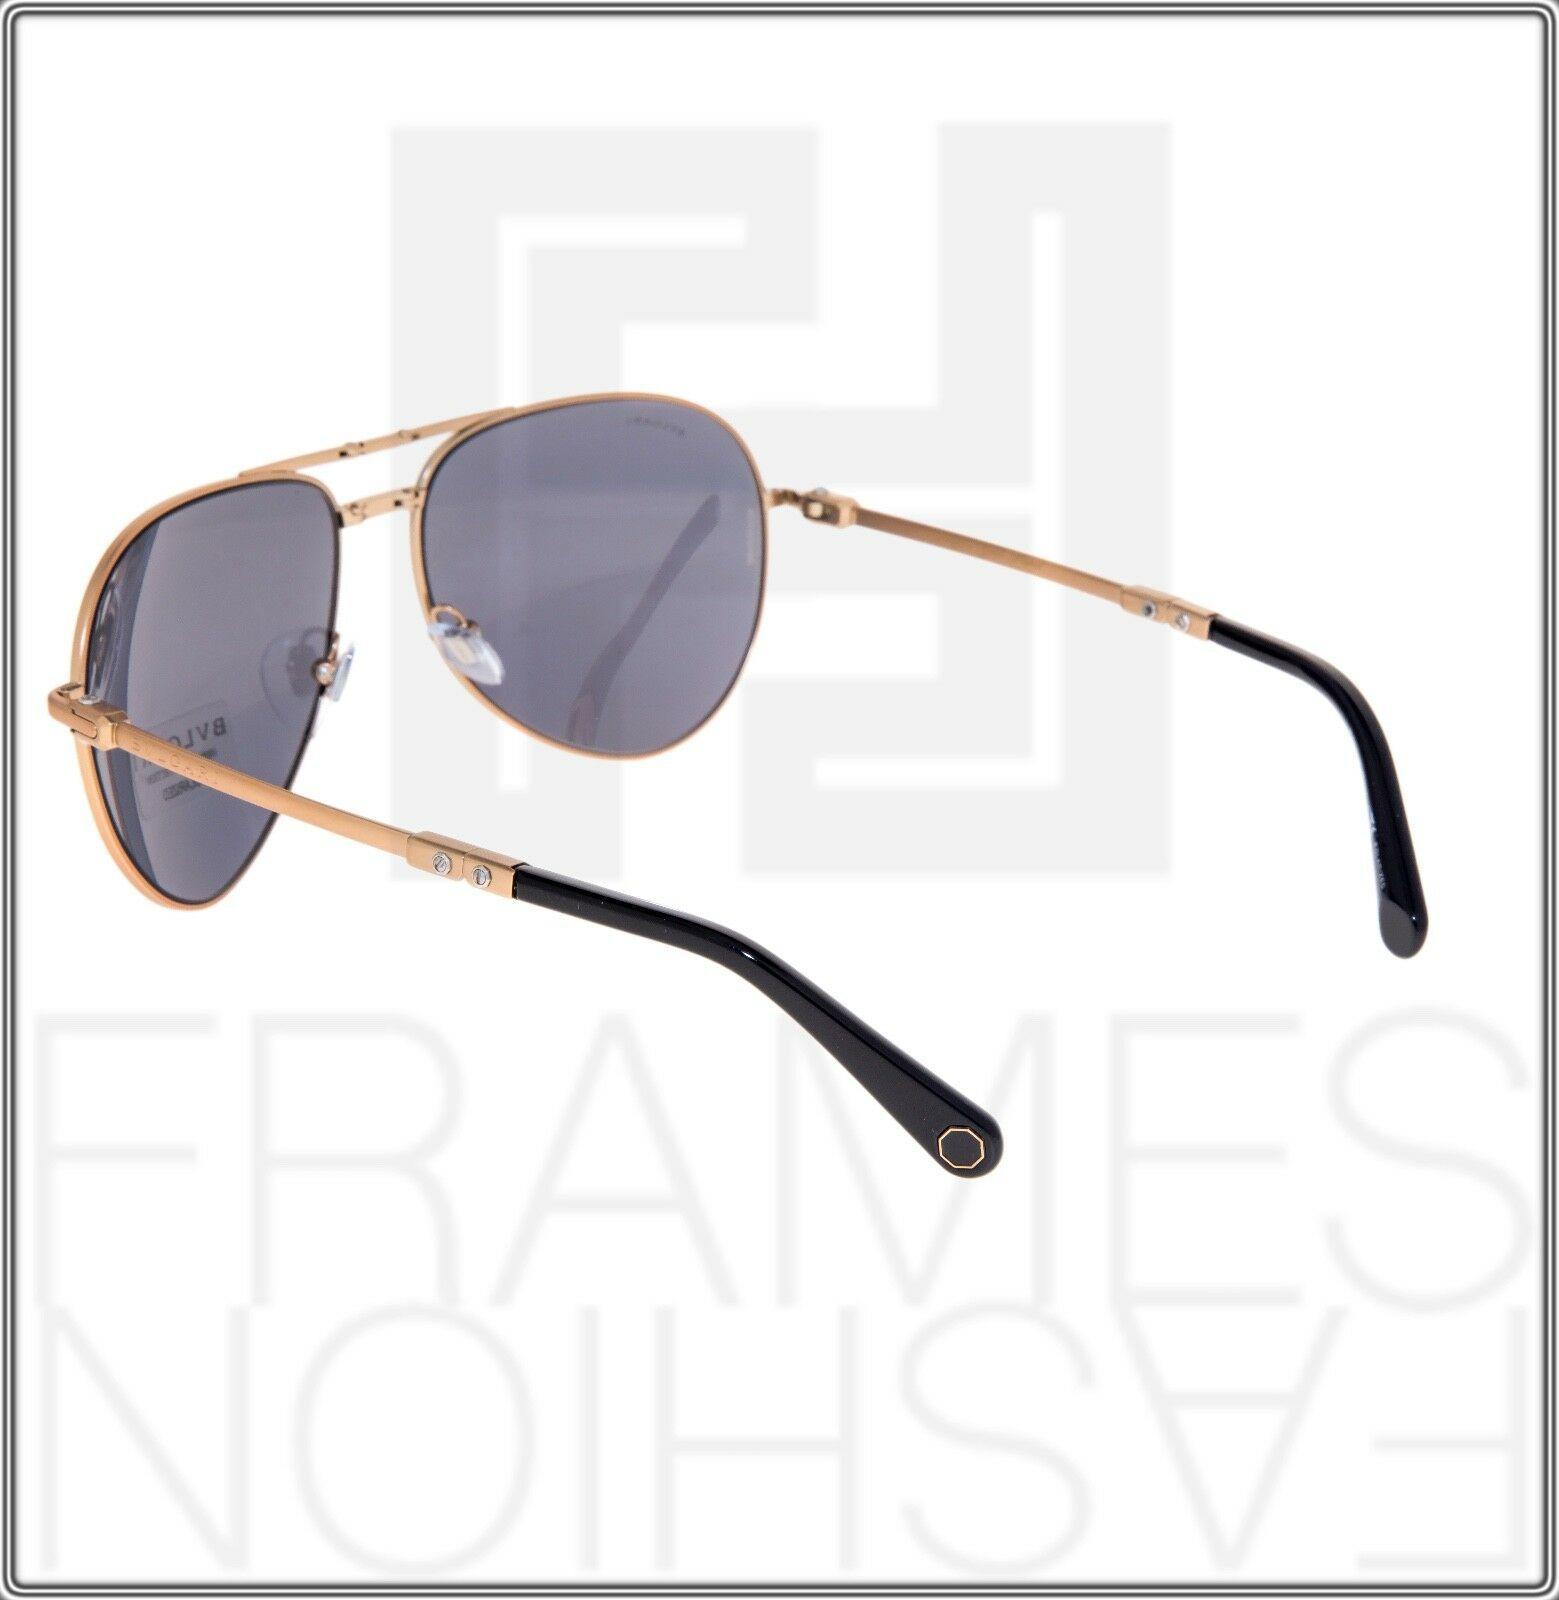 BVLGARI Le Gemme Black Rose Gold 18K Plated POLARIZED Foldable Sunglasses 5034 image 3